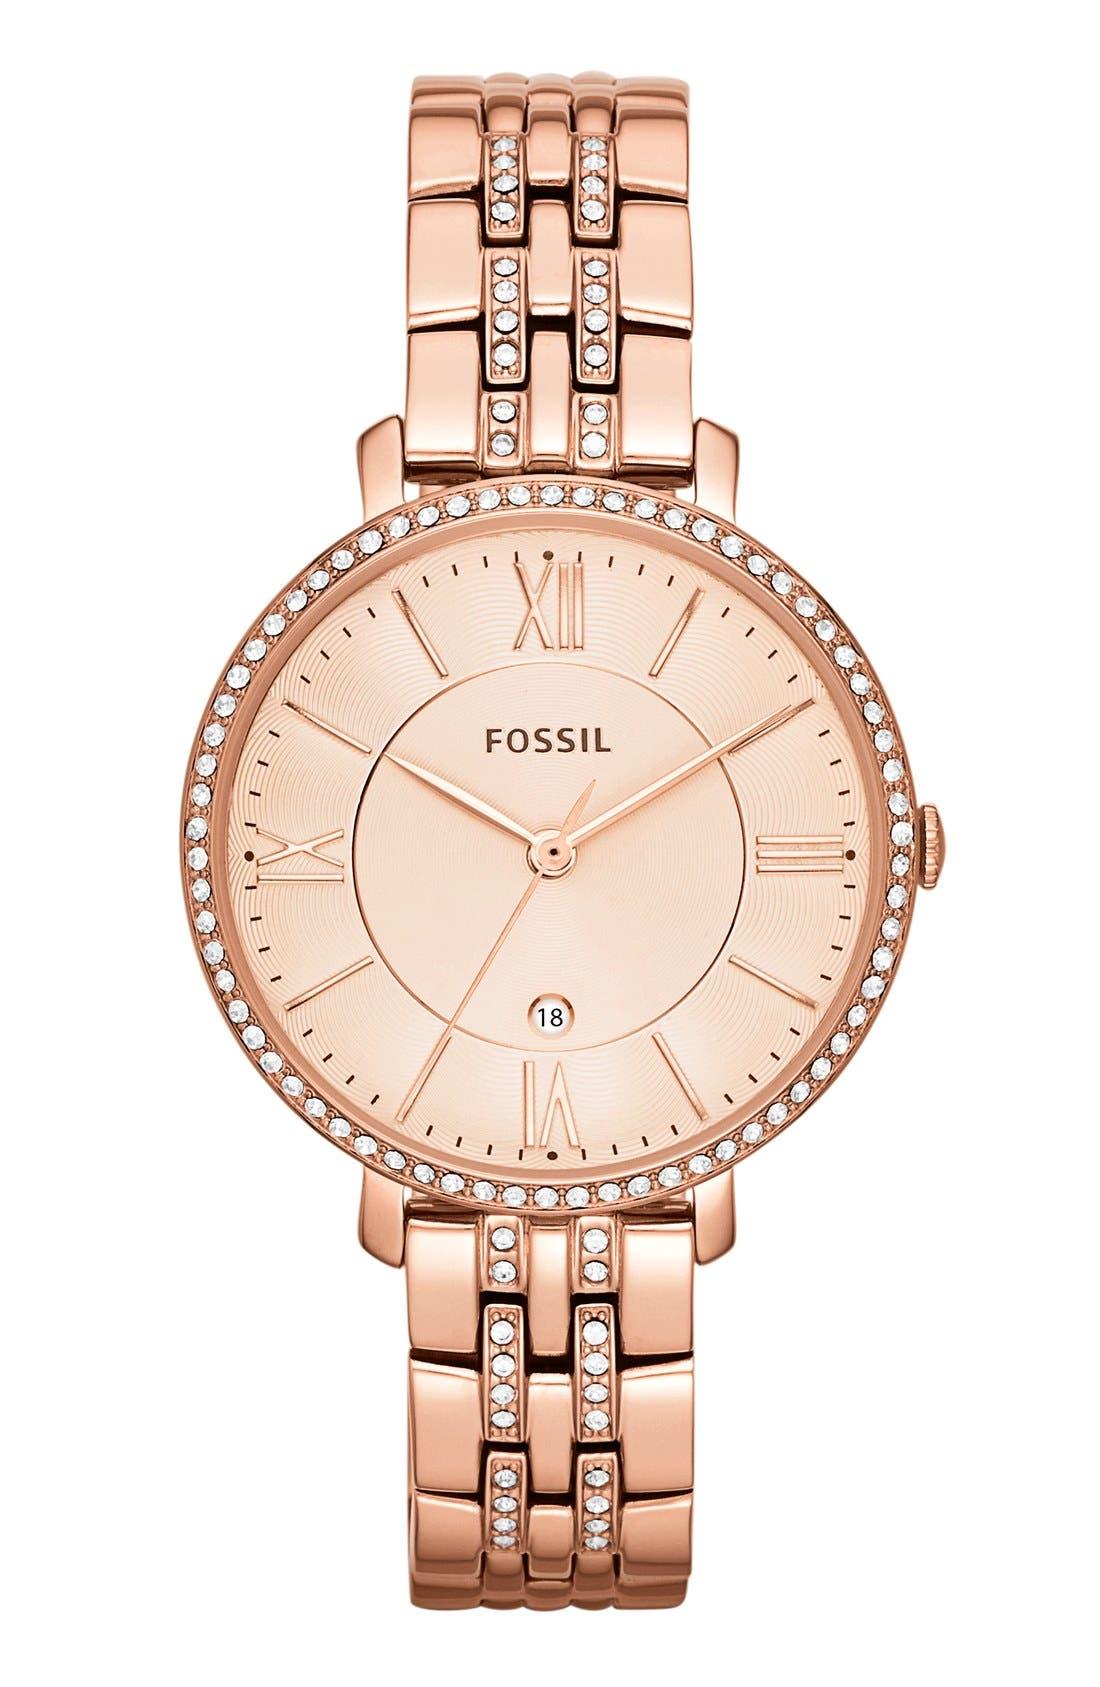 FOSSIL, 'Jacqueline' Crystal Bezel Bracelet Watch, 36mm, Main thumbnail 1, color, ROSE GOLD